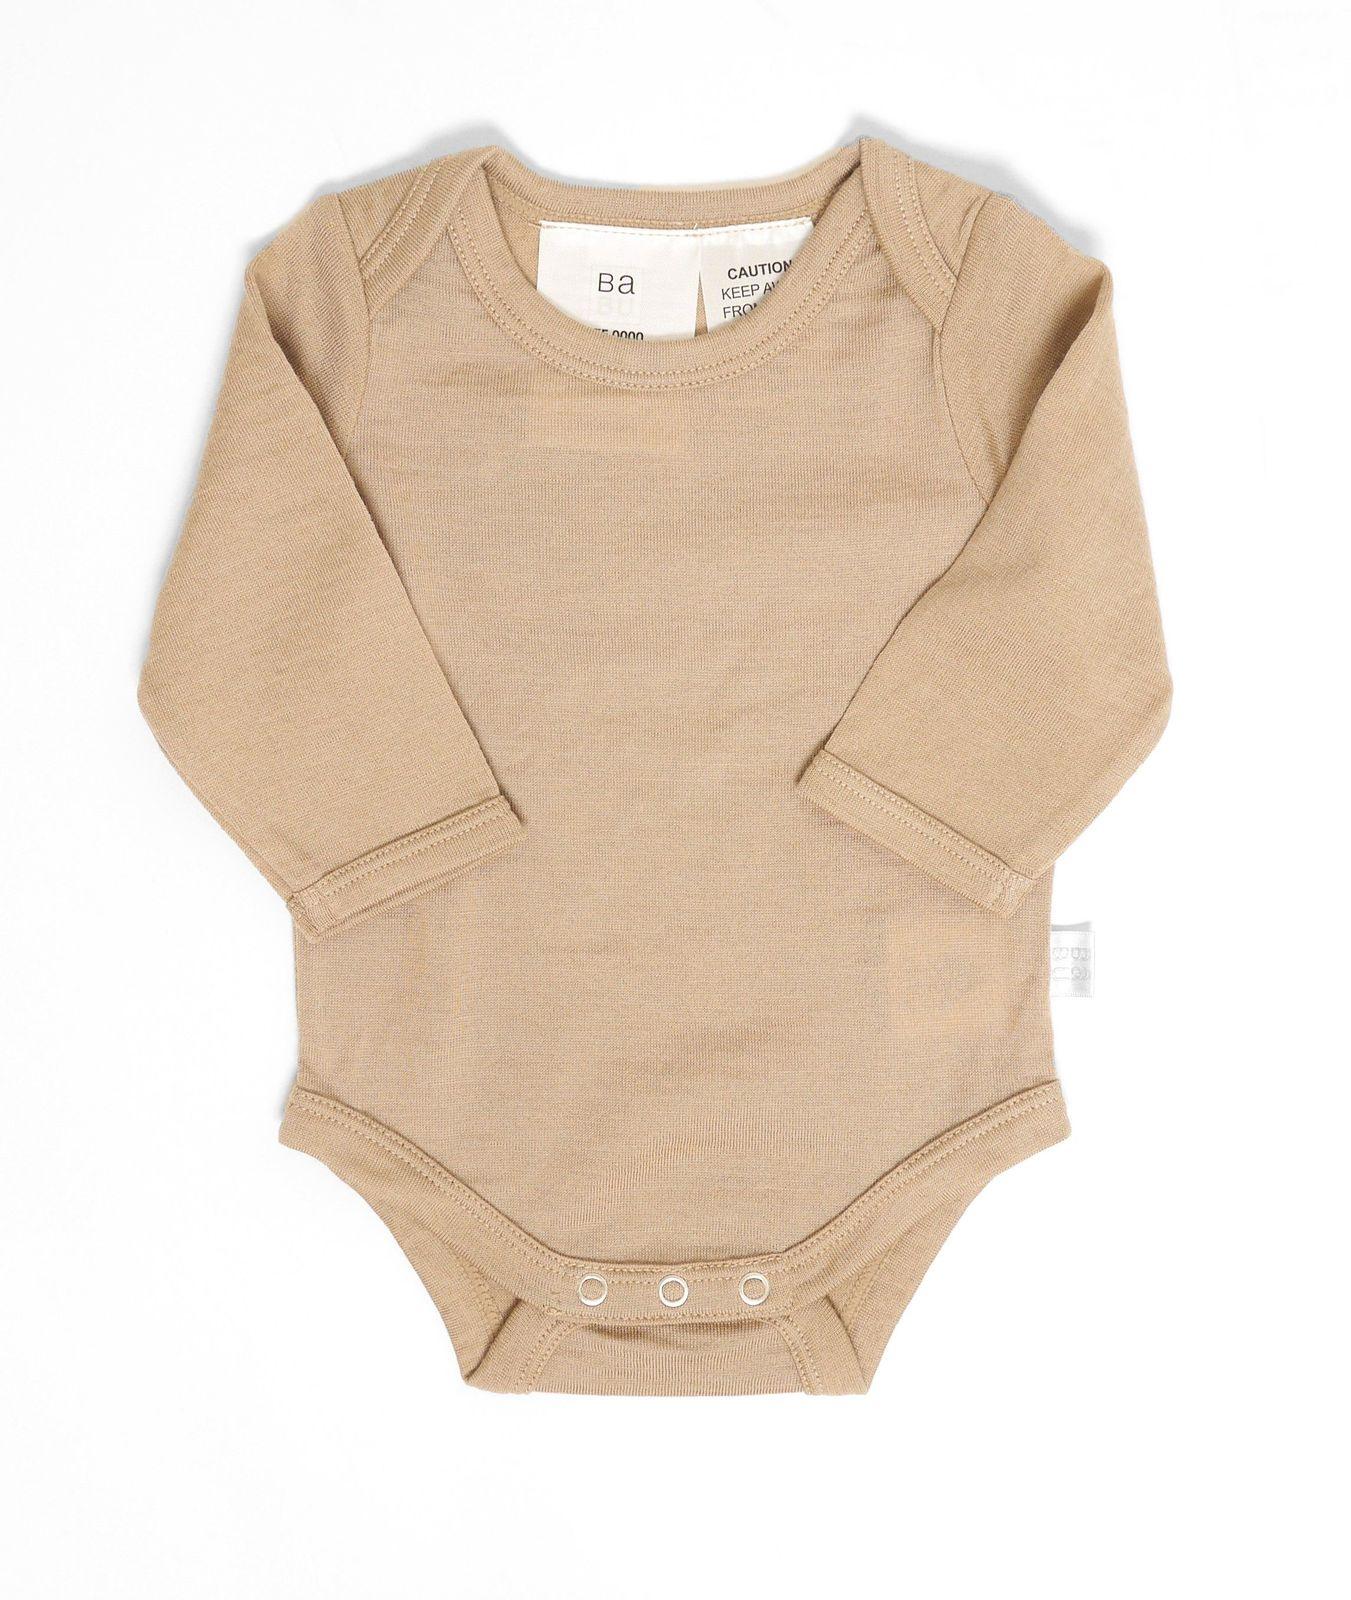 Babu: Merino Long Sleeve Body Suit - Sand (1 Year) image